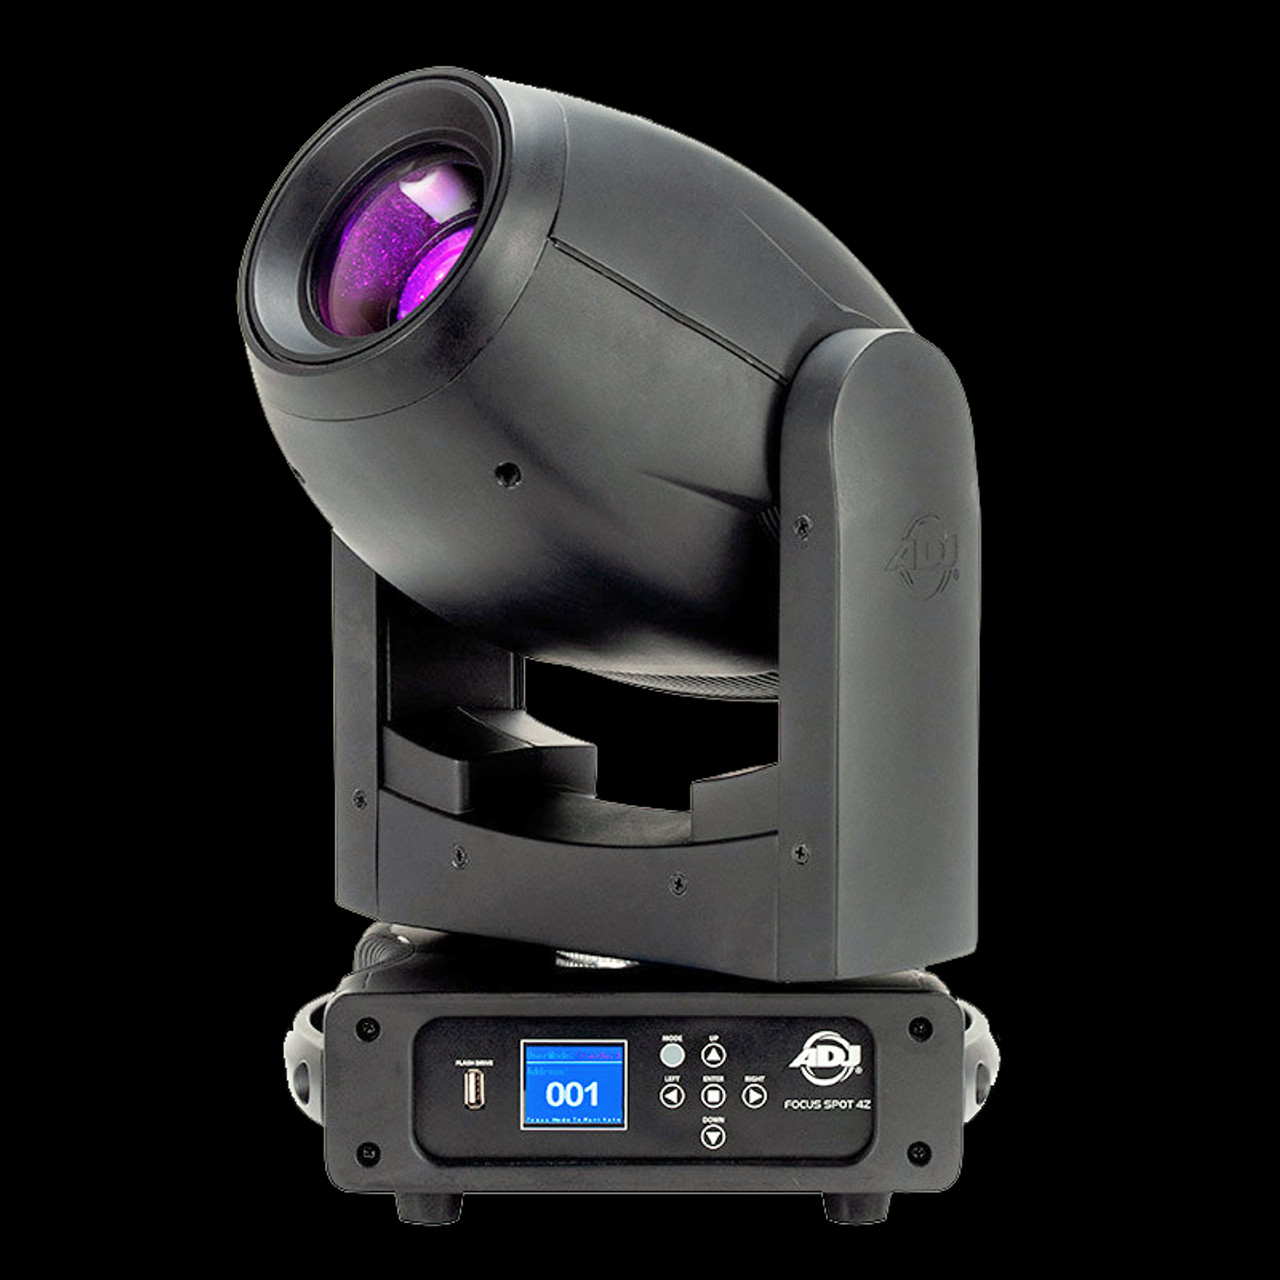 ADJ Focus Spot 4Z LED Moving Head Spot w/ Motorized Focus + Zoom